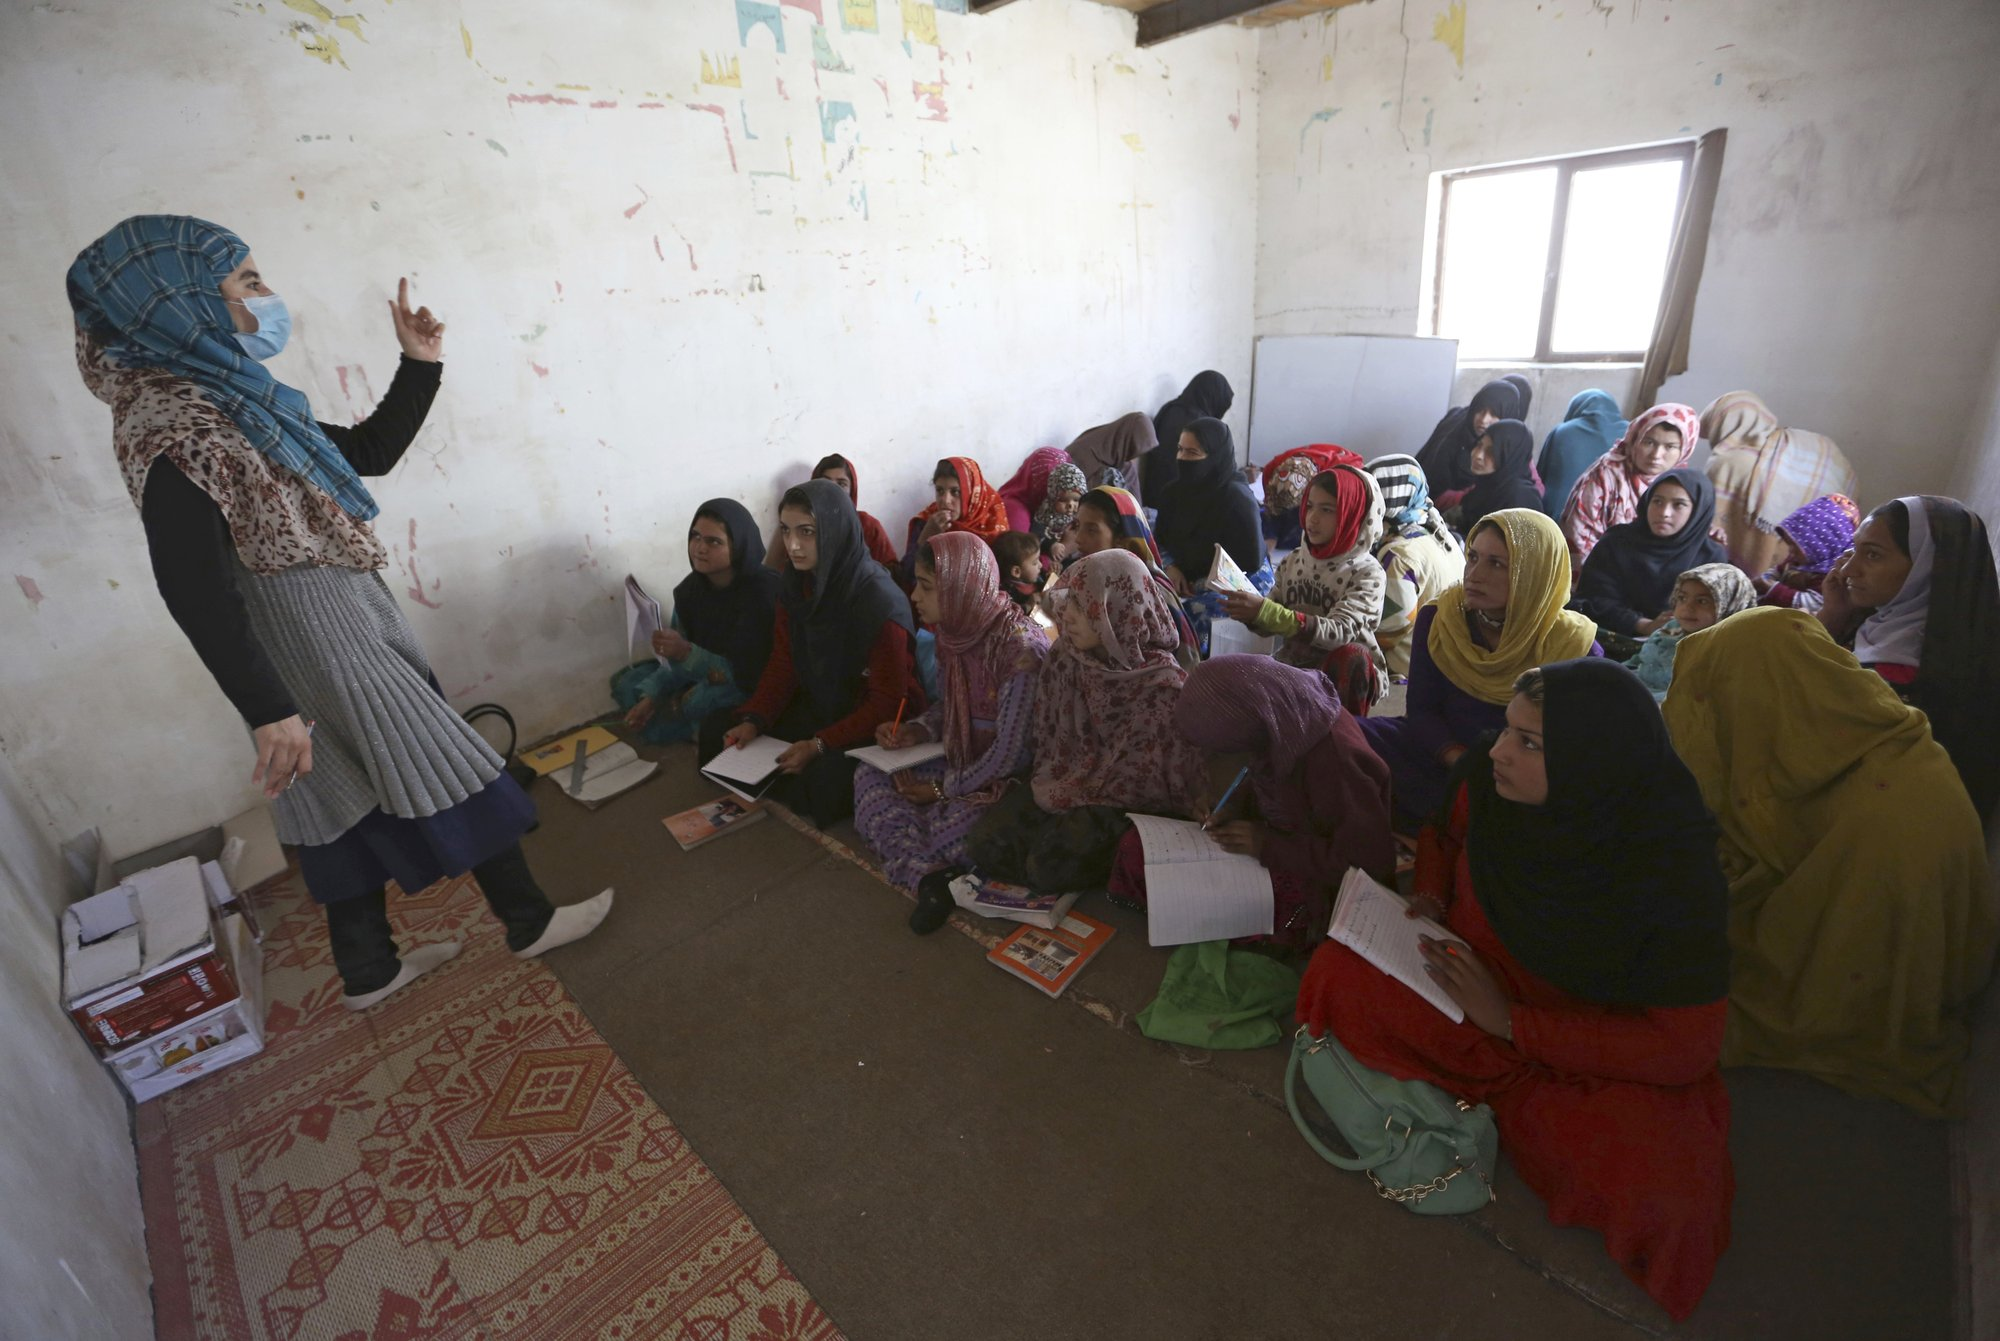 UN agency: Attacks on schools in Afghanistan tripled in 2018